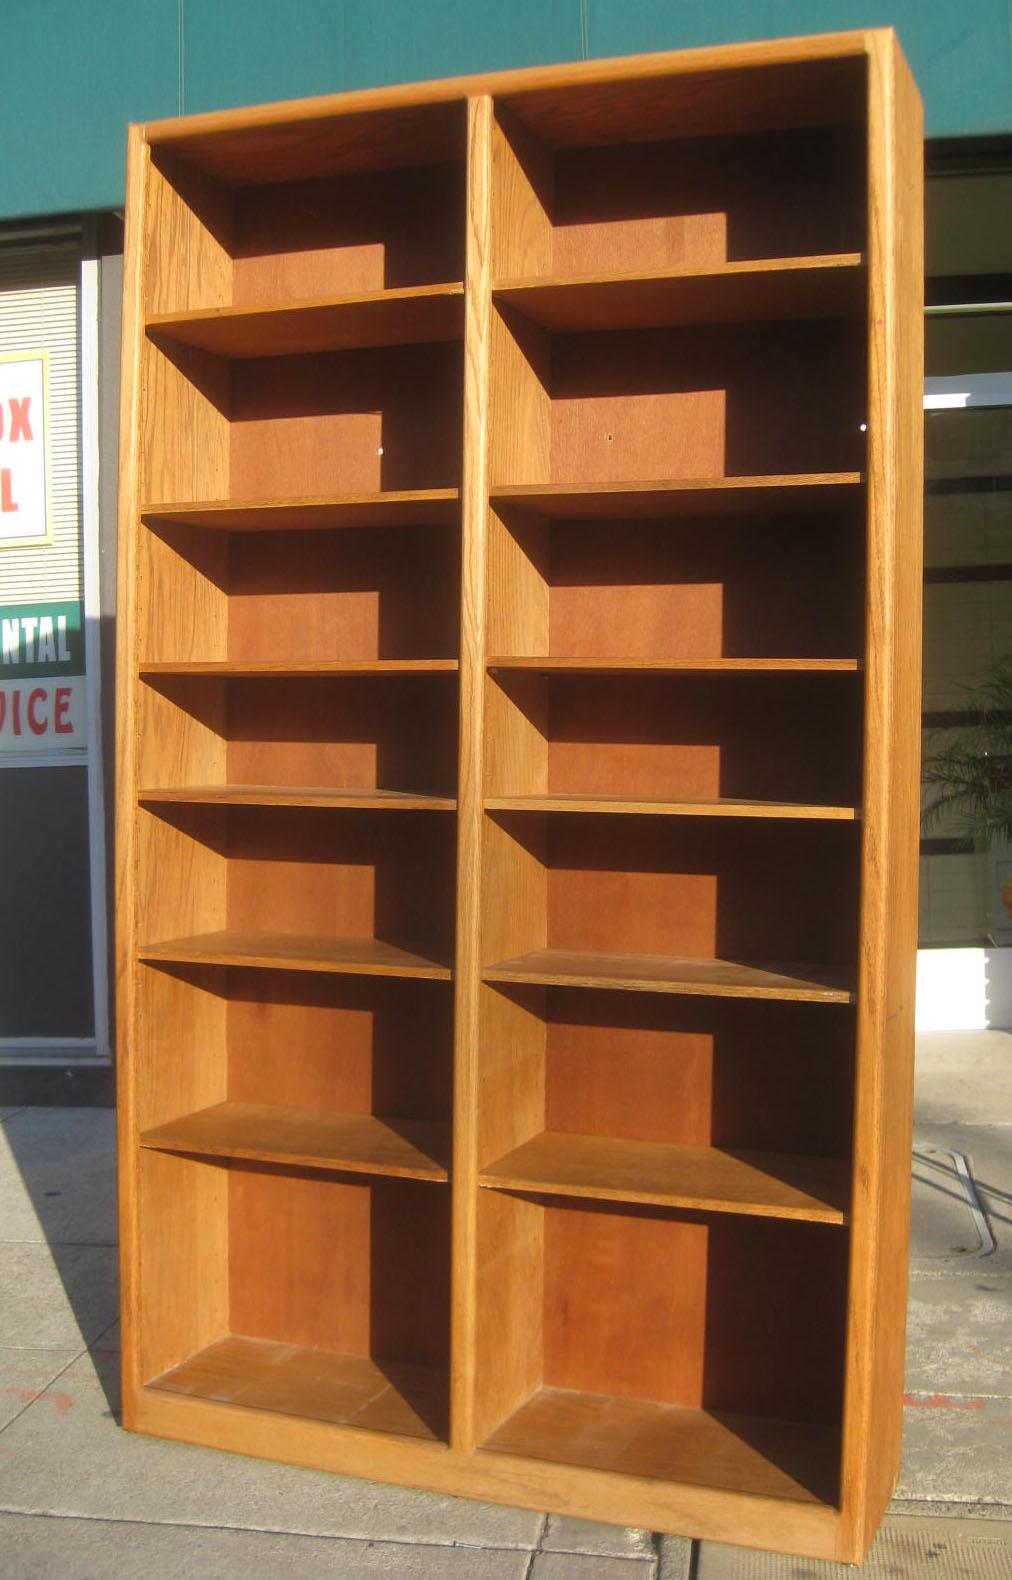 SOLD - Tall Double Bookshelf - $85